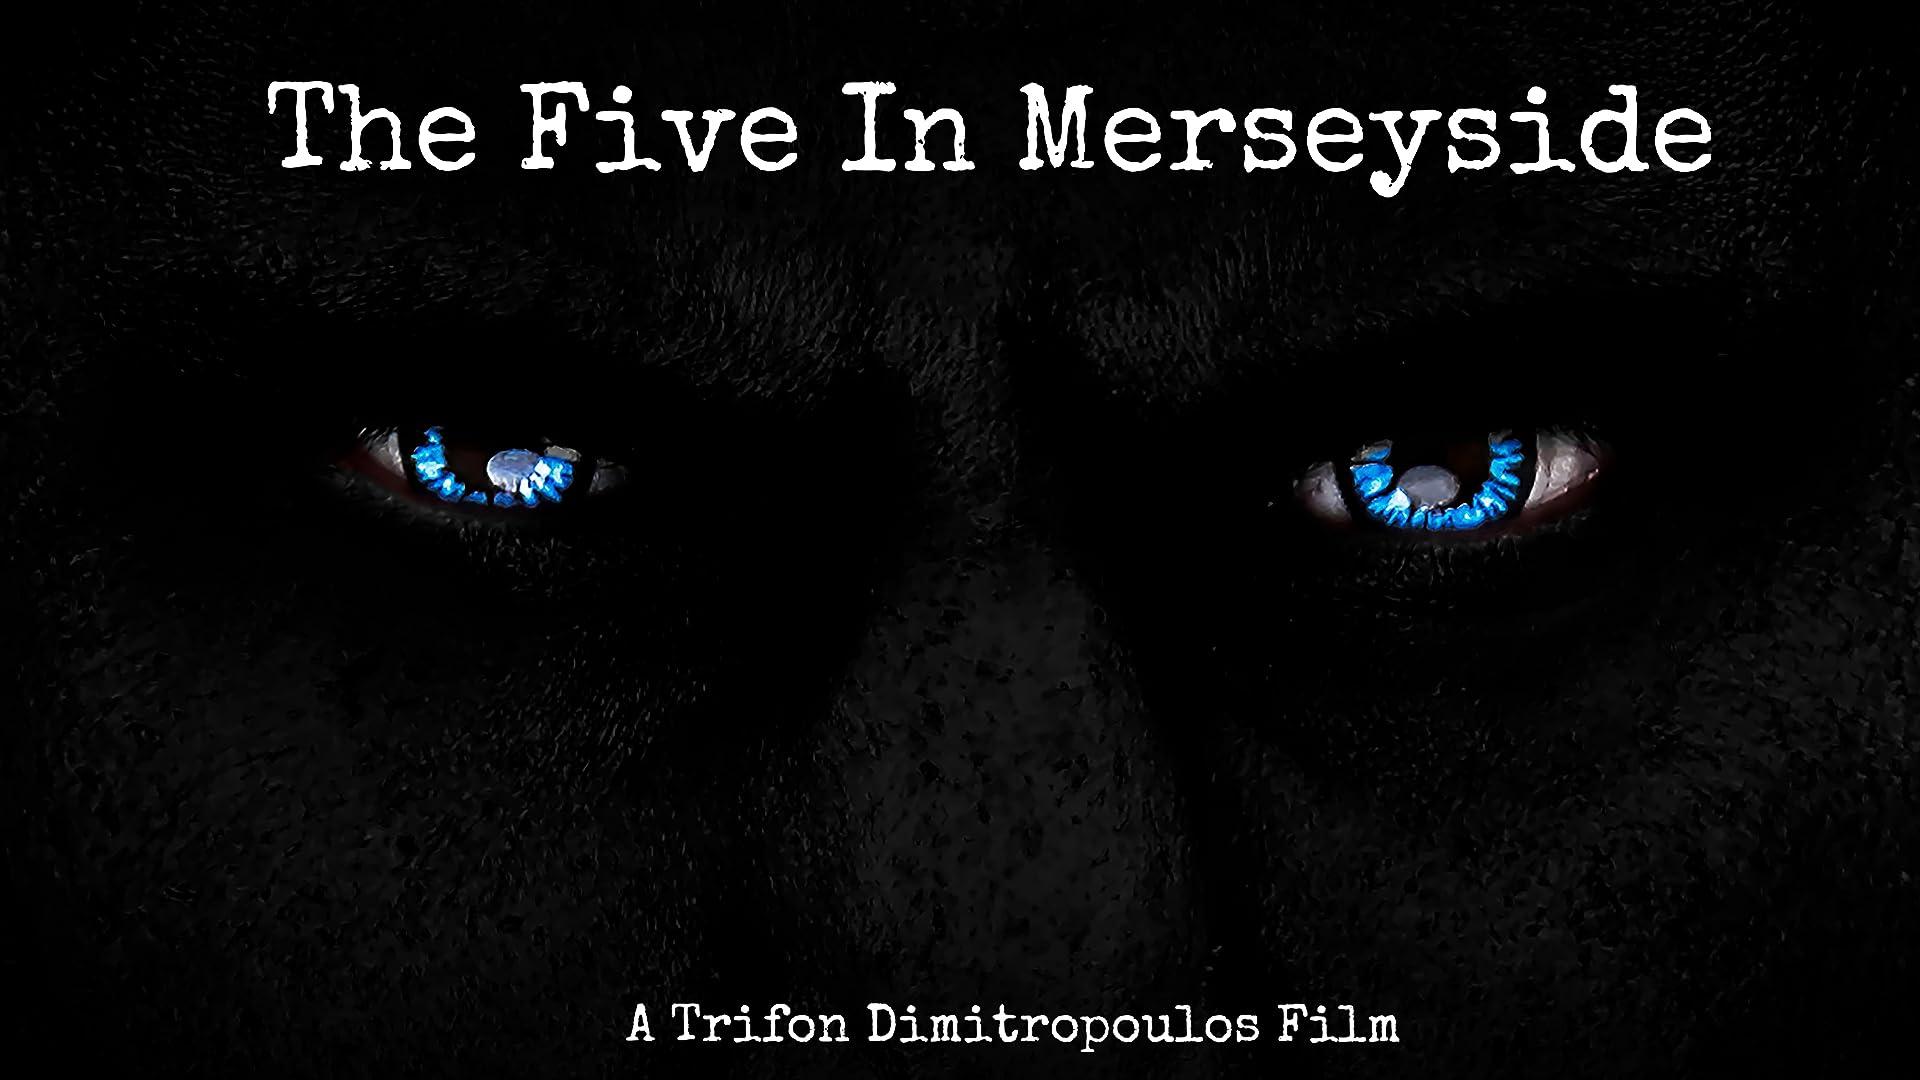 The Five In Merseyside